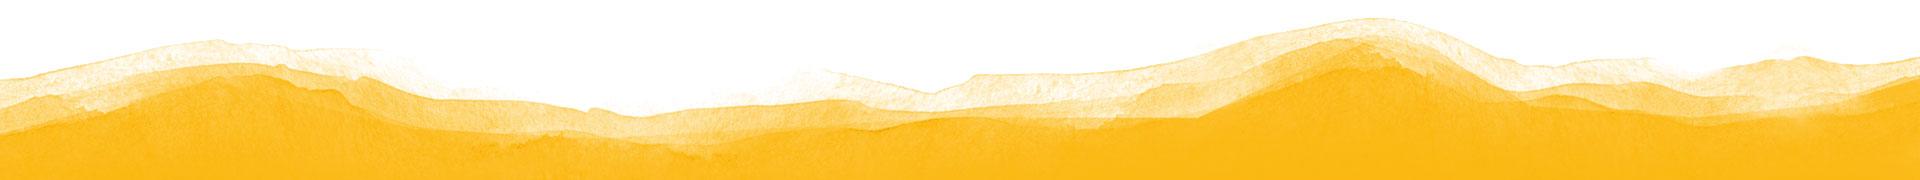 Clearwater-Farm-Divider-Organic-Dairy-Citrus.jpg